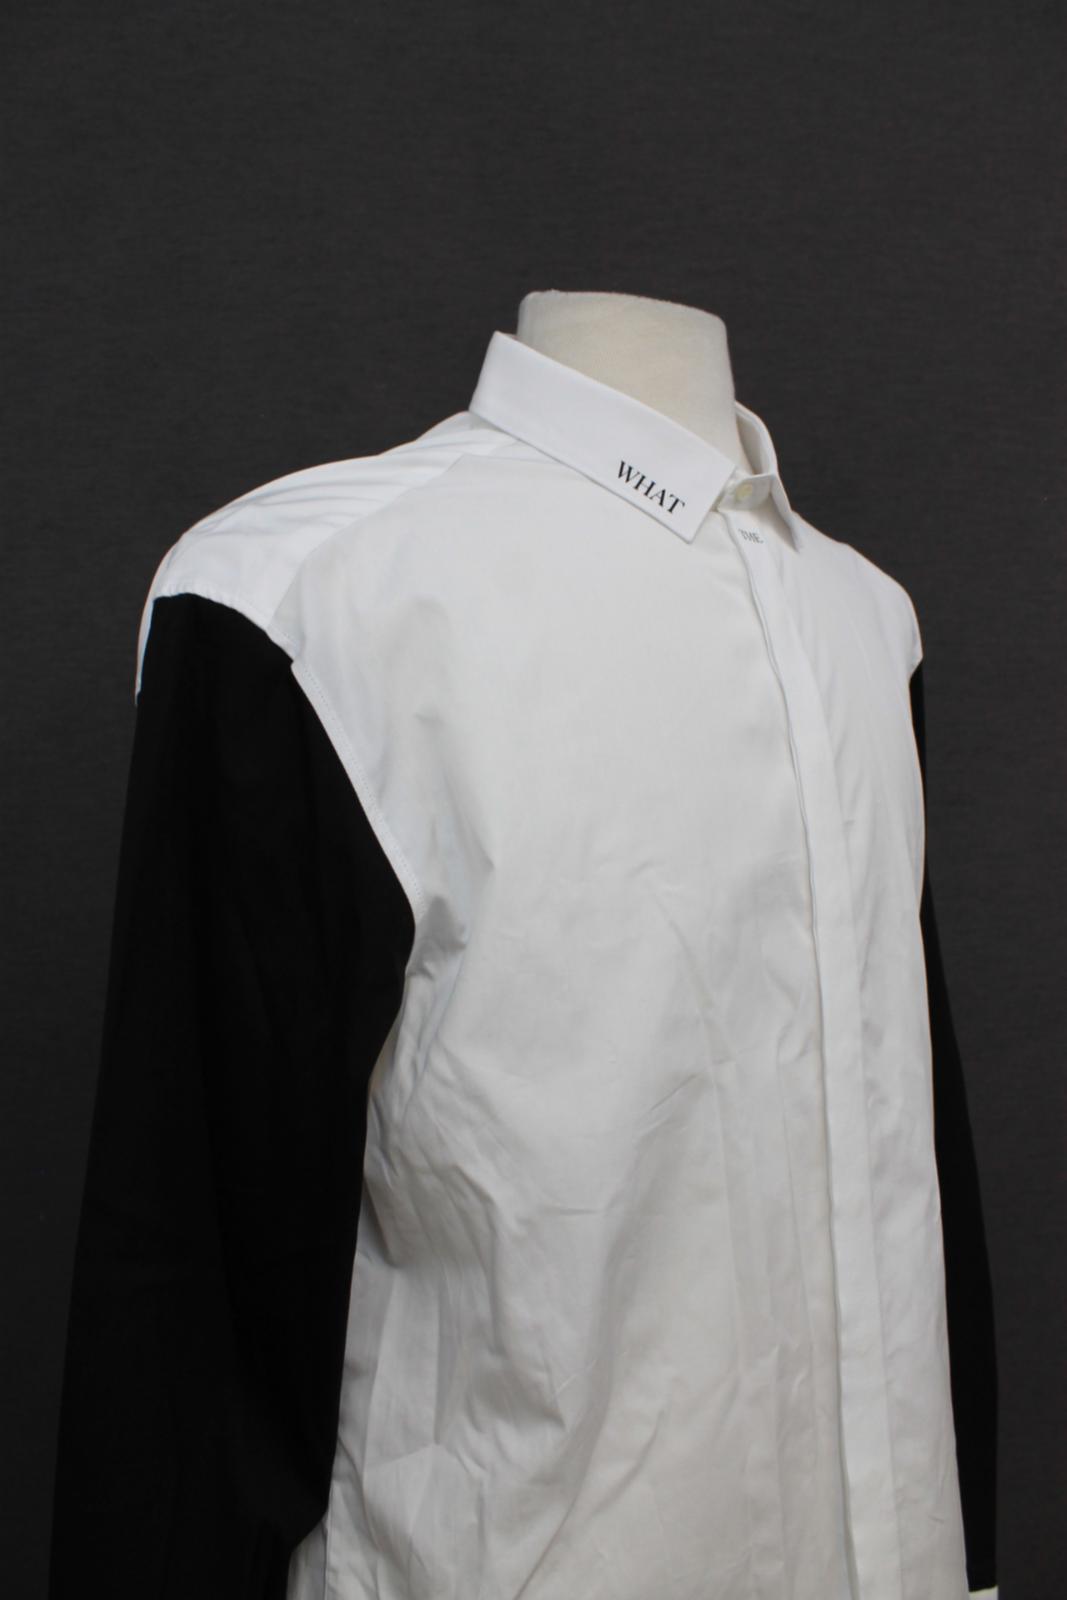 Neil-Barrett-Hombre-Blanco-De-Algodon-Manga-Negra-lo-que-el-F-Con-Cuello-Camisa-17-034 miniatura 8